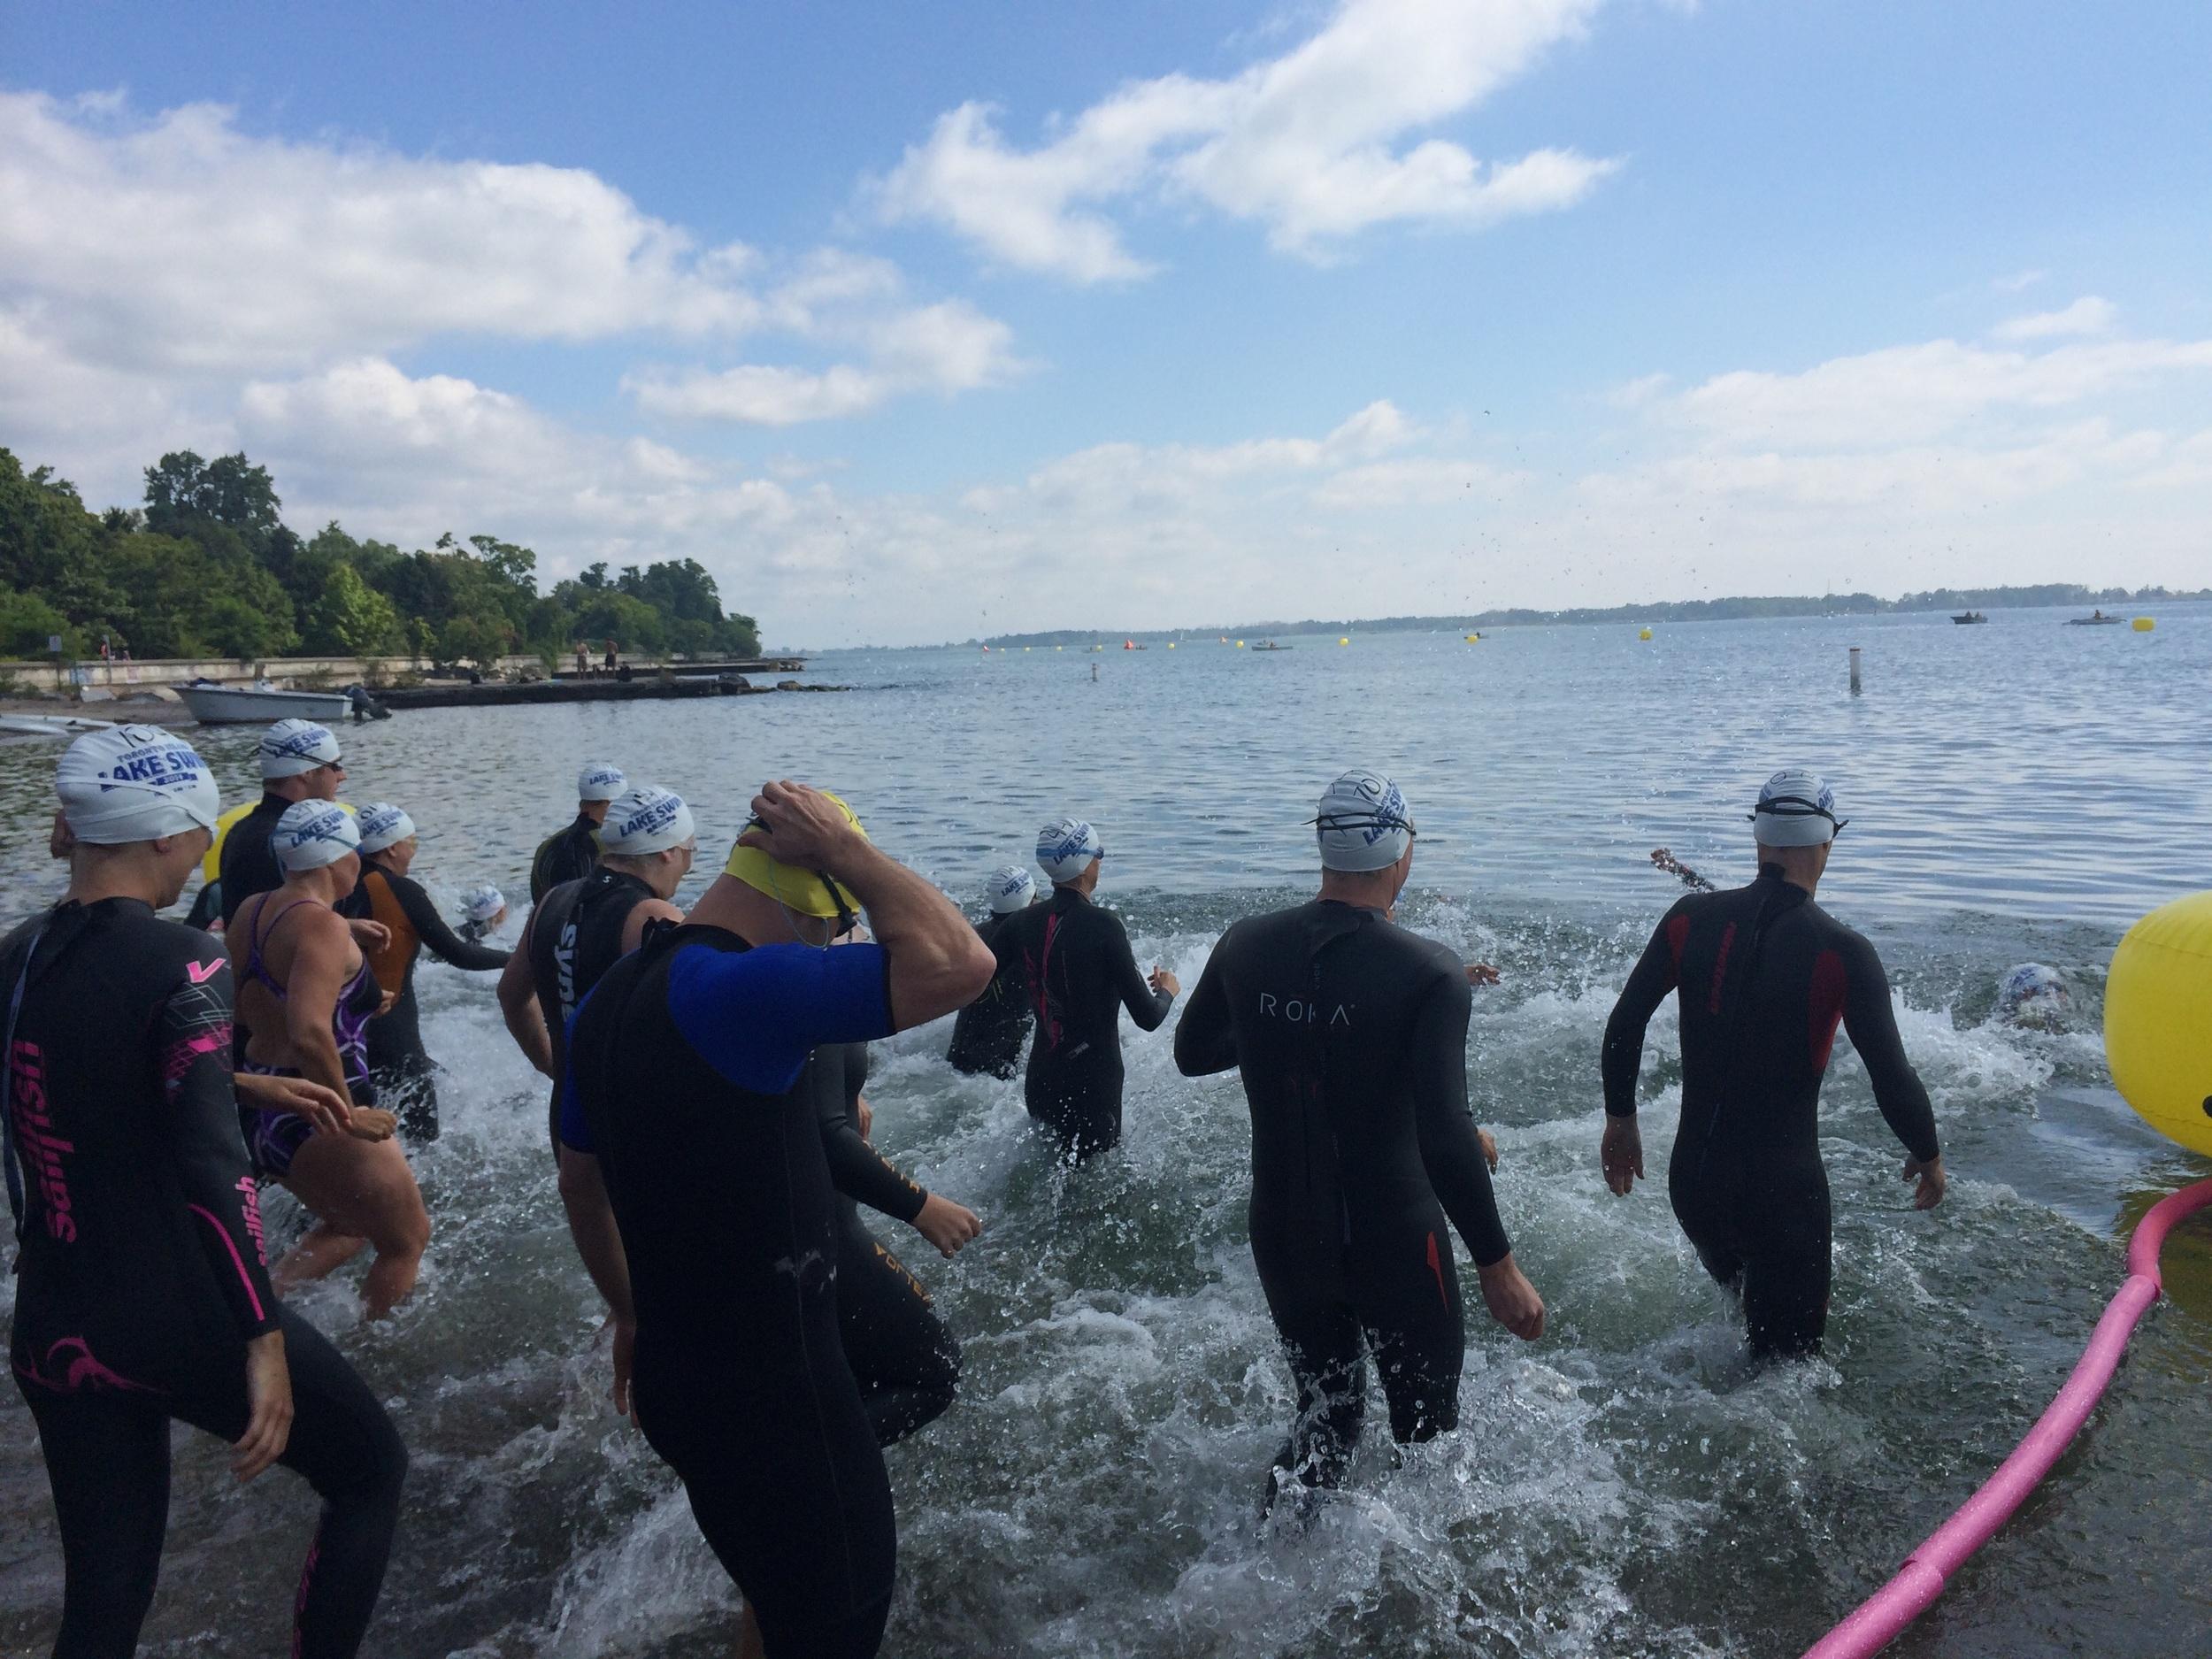 Swimmers getting a good start at the 2014 Toronto Island Lake Swim. (Photo via Lake Ontario Waterkeeper)